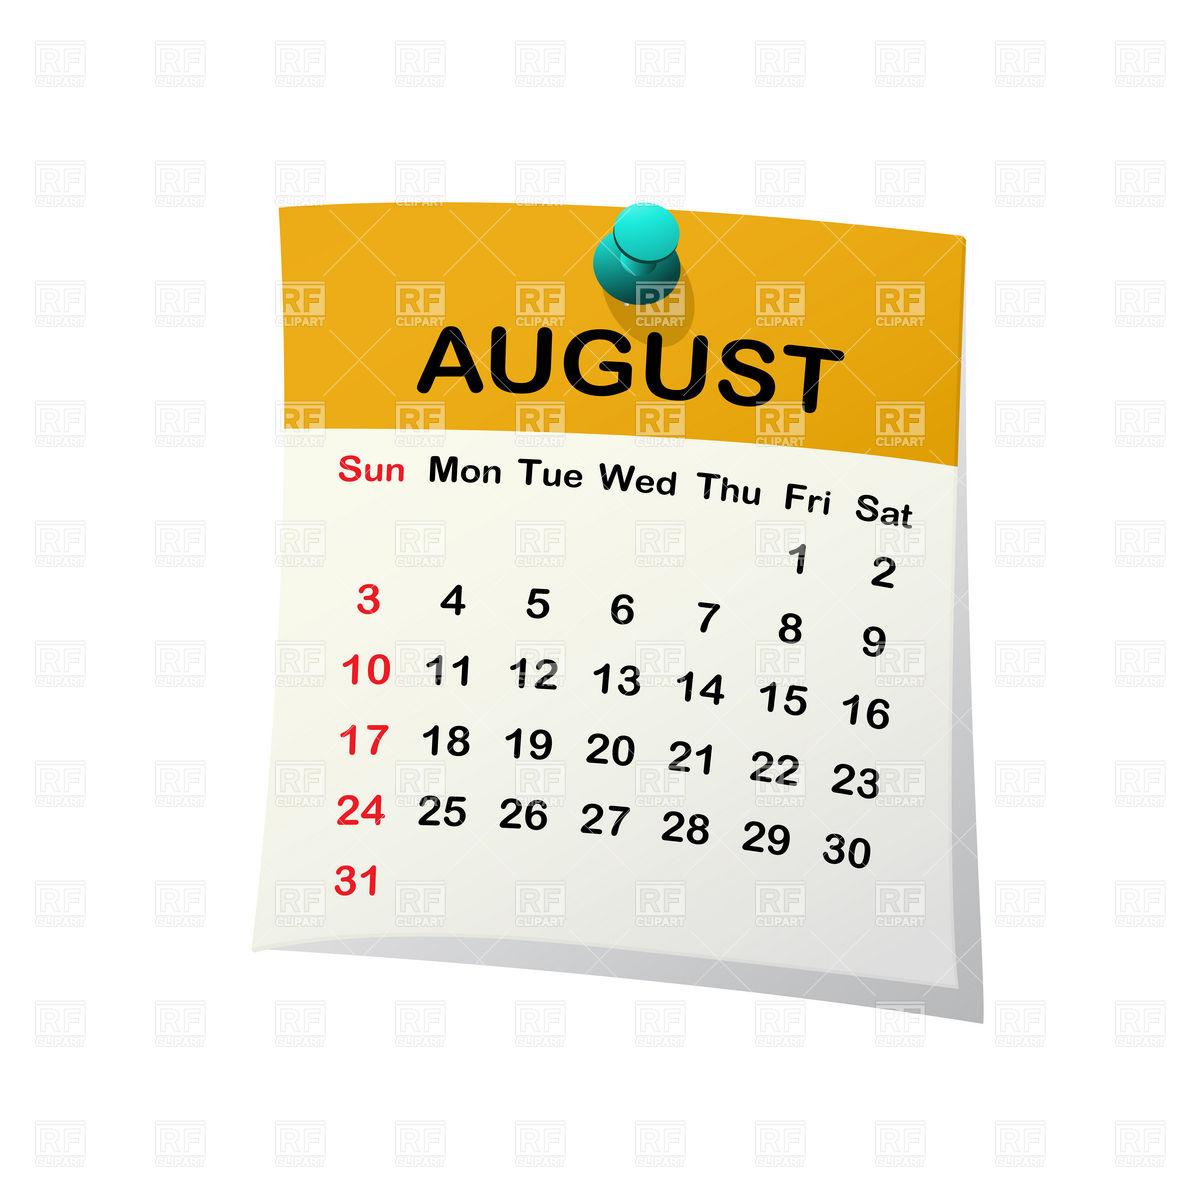 August 2014 month calendar Stock Vector Image.